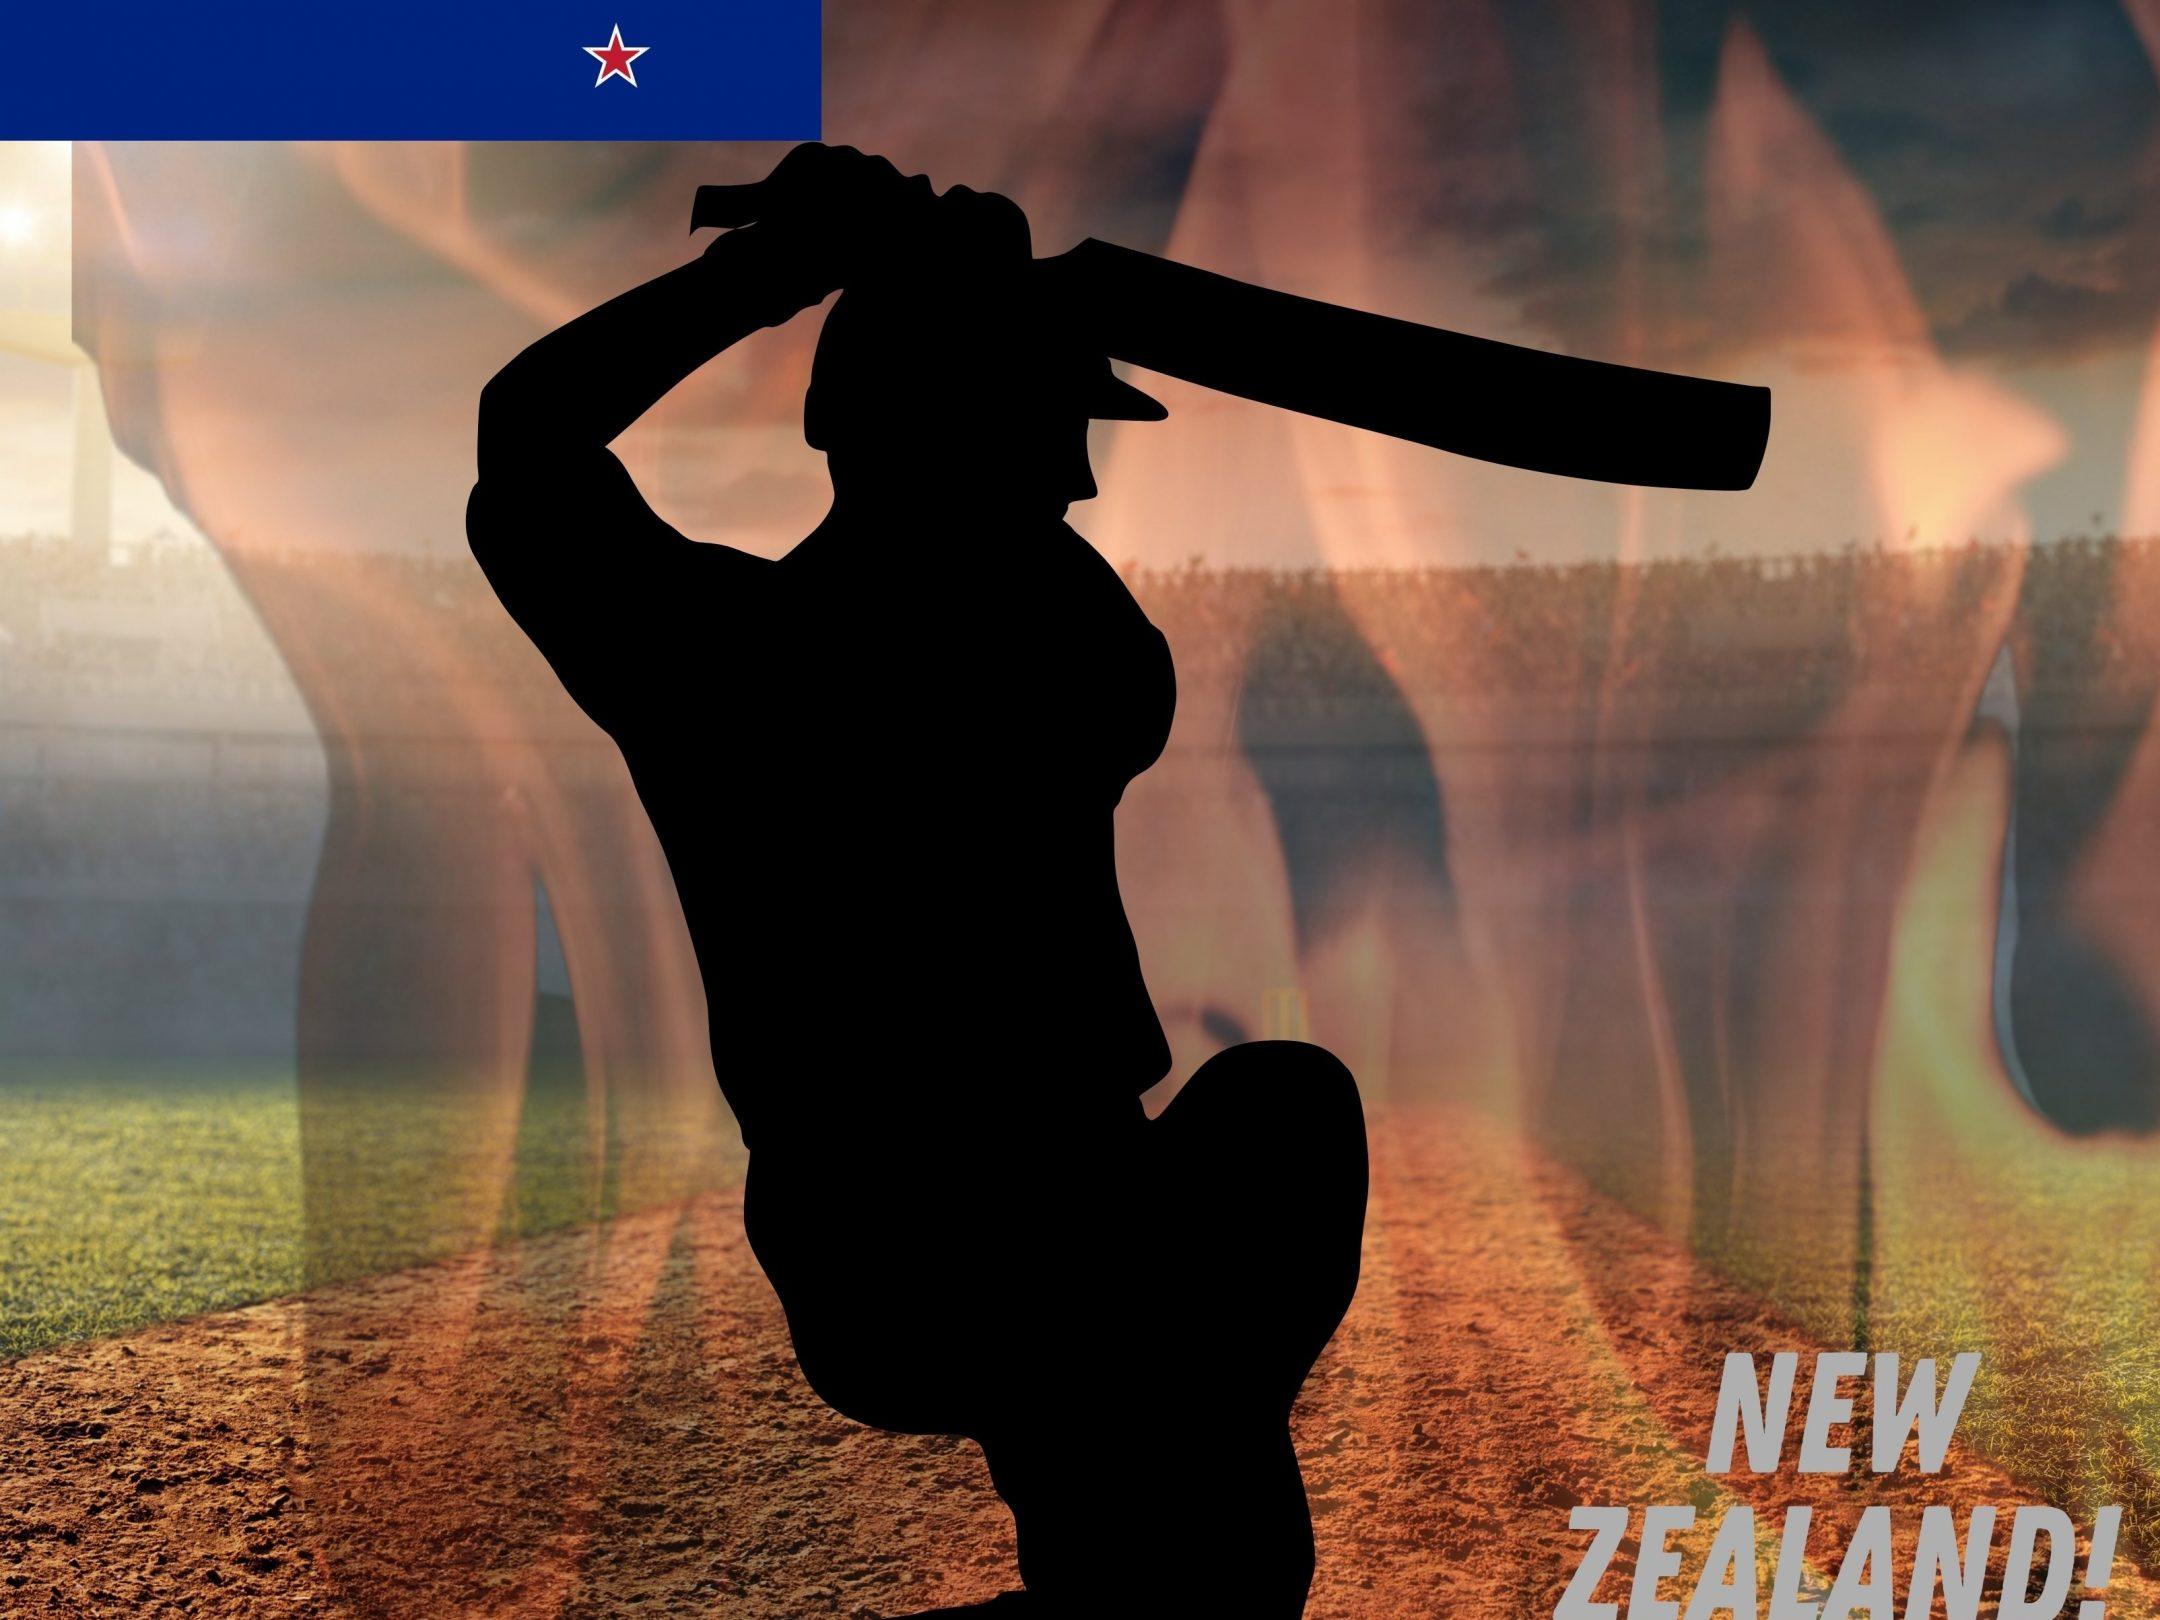 2160x1620 iPad wallpaper 4k New Zealand Cricket Stadium iPad Wallpaper 2160x1620 pixels resolution